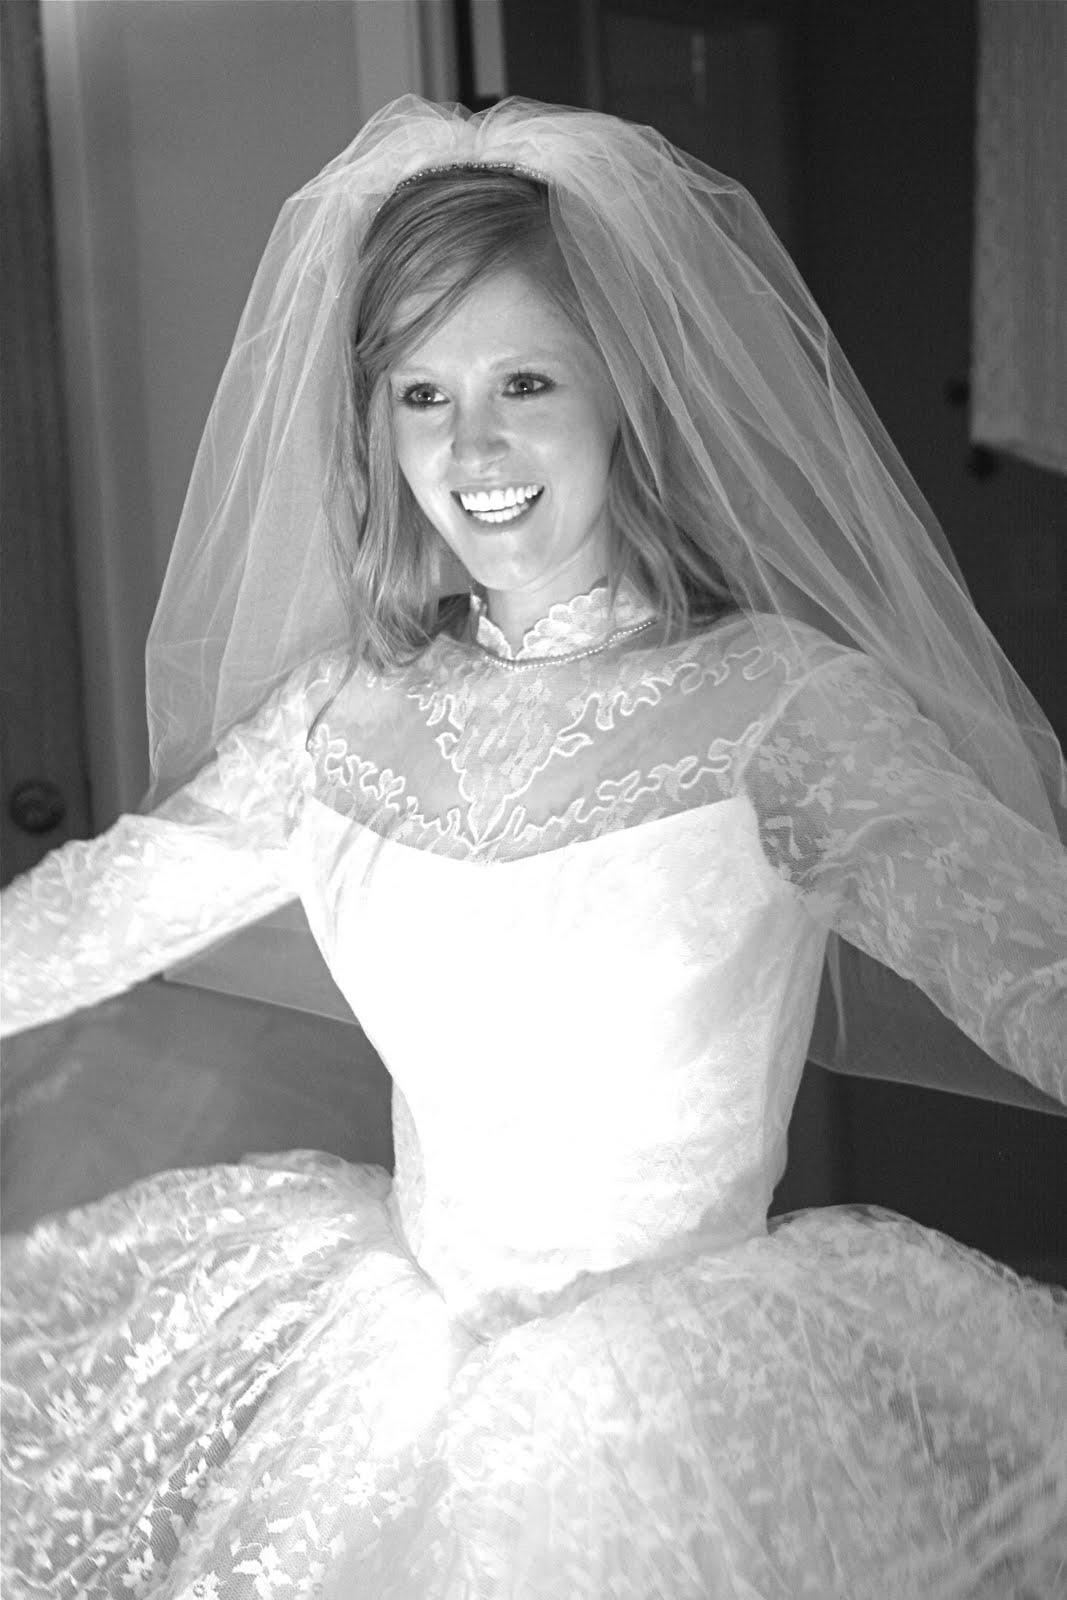 Lizzie Jayne 50s style wedding